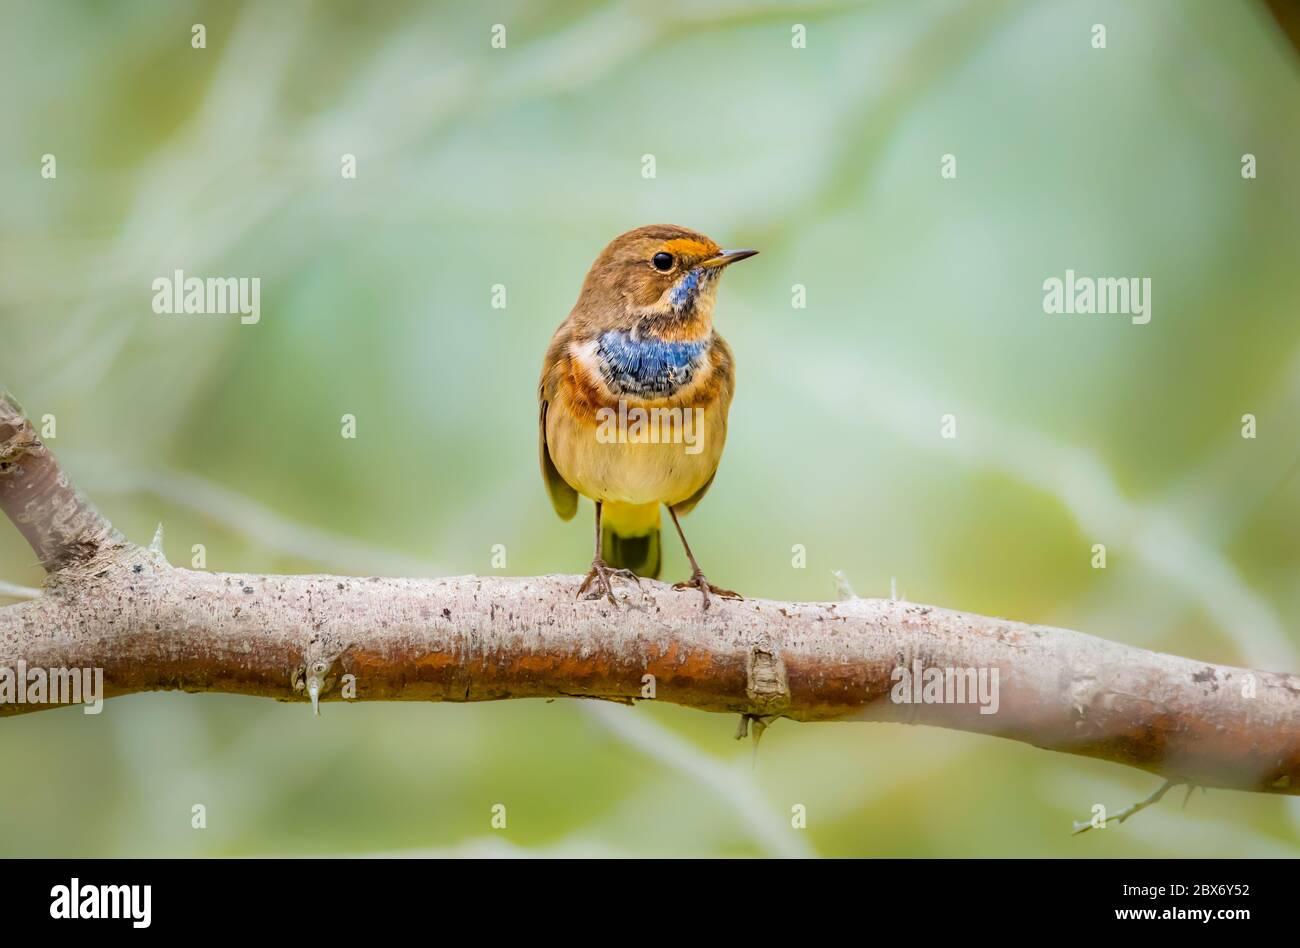 Beautiful shot of bluethroat bird a member of the thrush family Turdidae Stock Photo